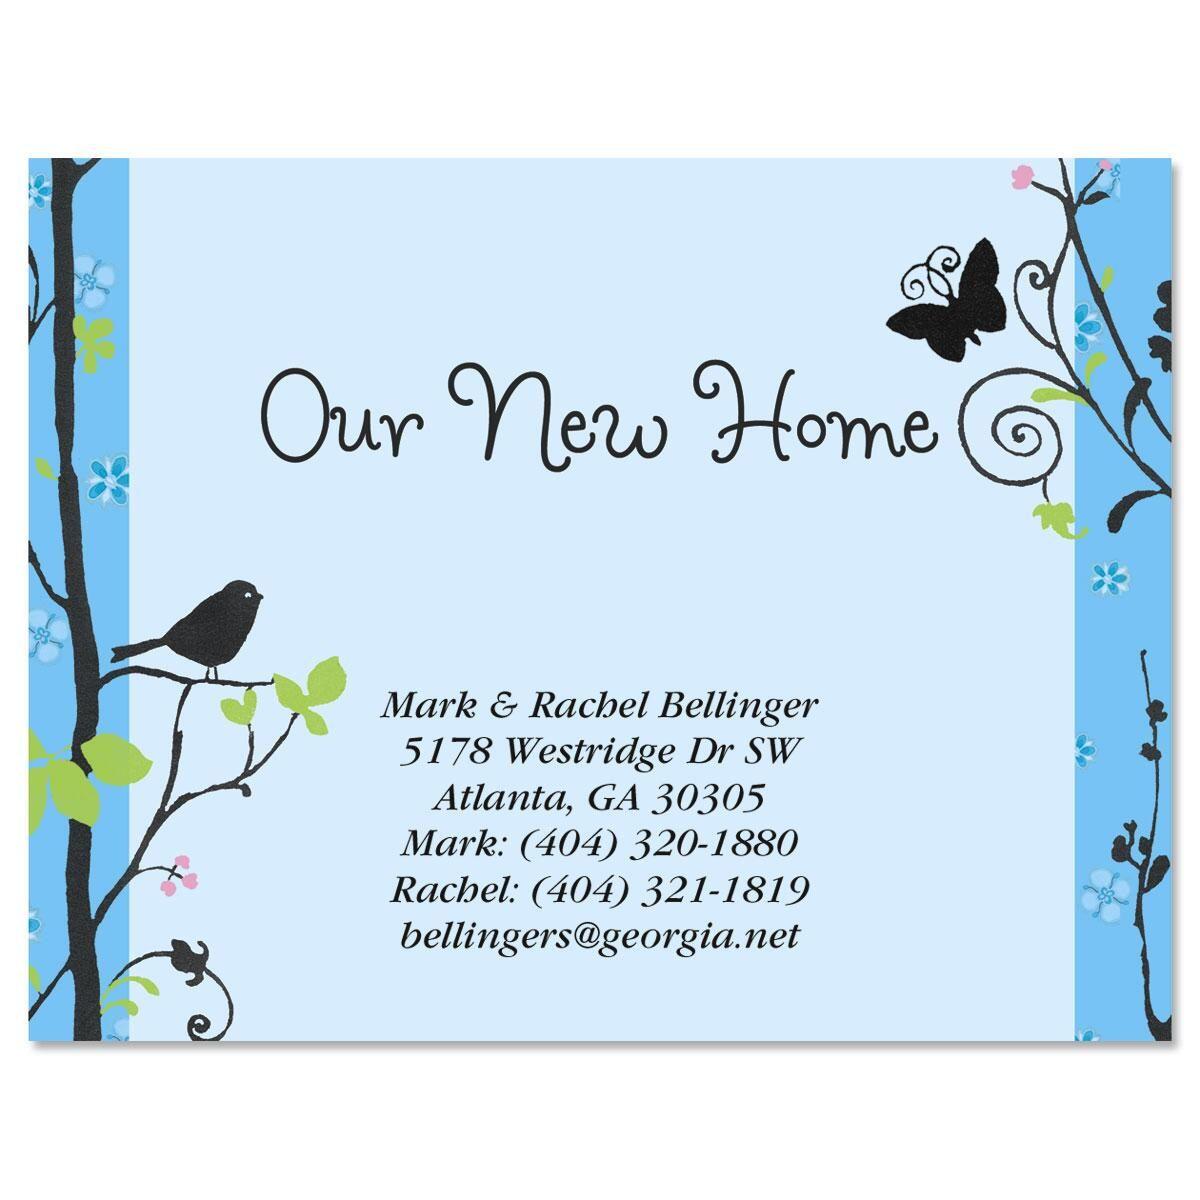 Songbird new address postcards current catalog for Custom new address cards